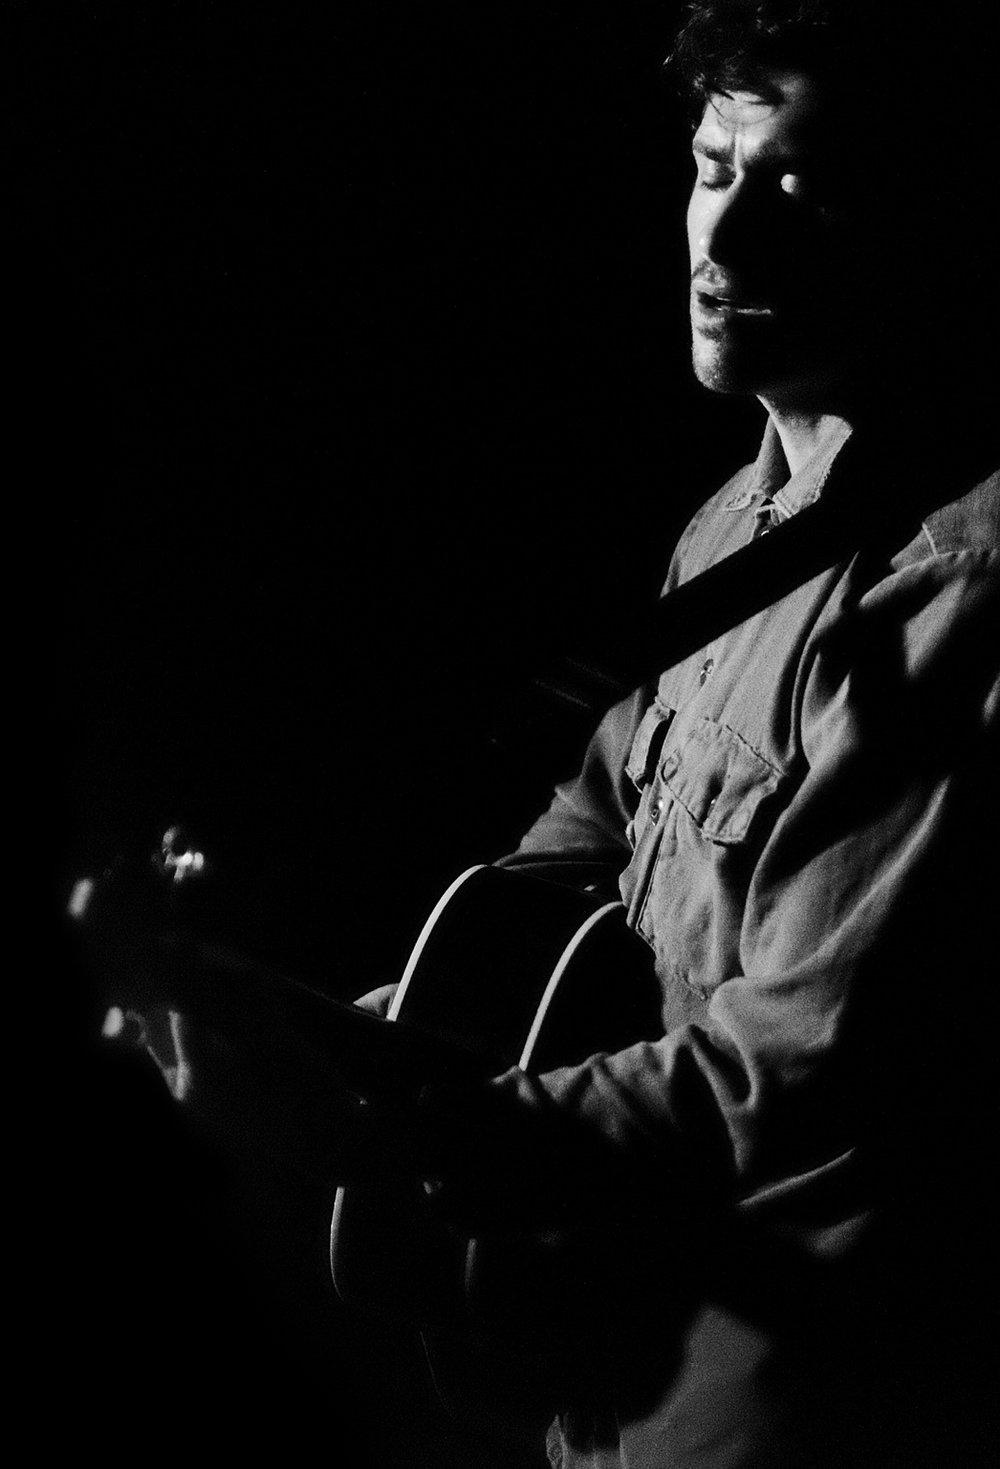 C.SHIROCK - Chuck Shirock Eric BLackmon Tulum Mexico Live Performance - Cropped.jpg